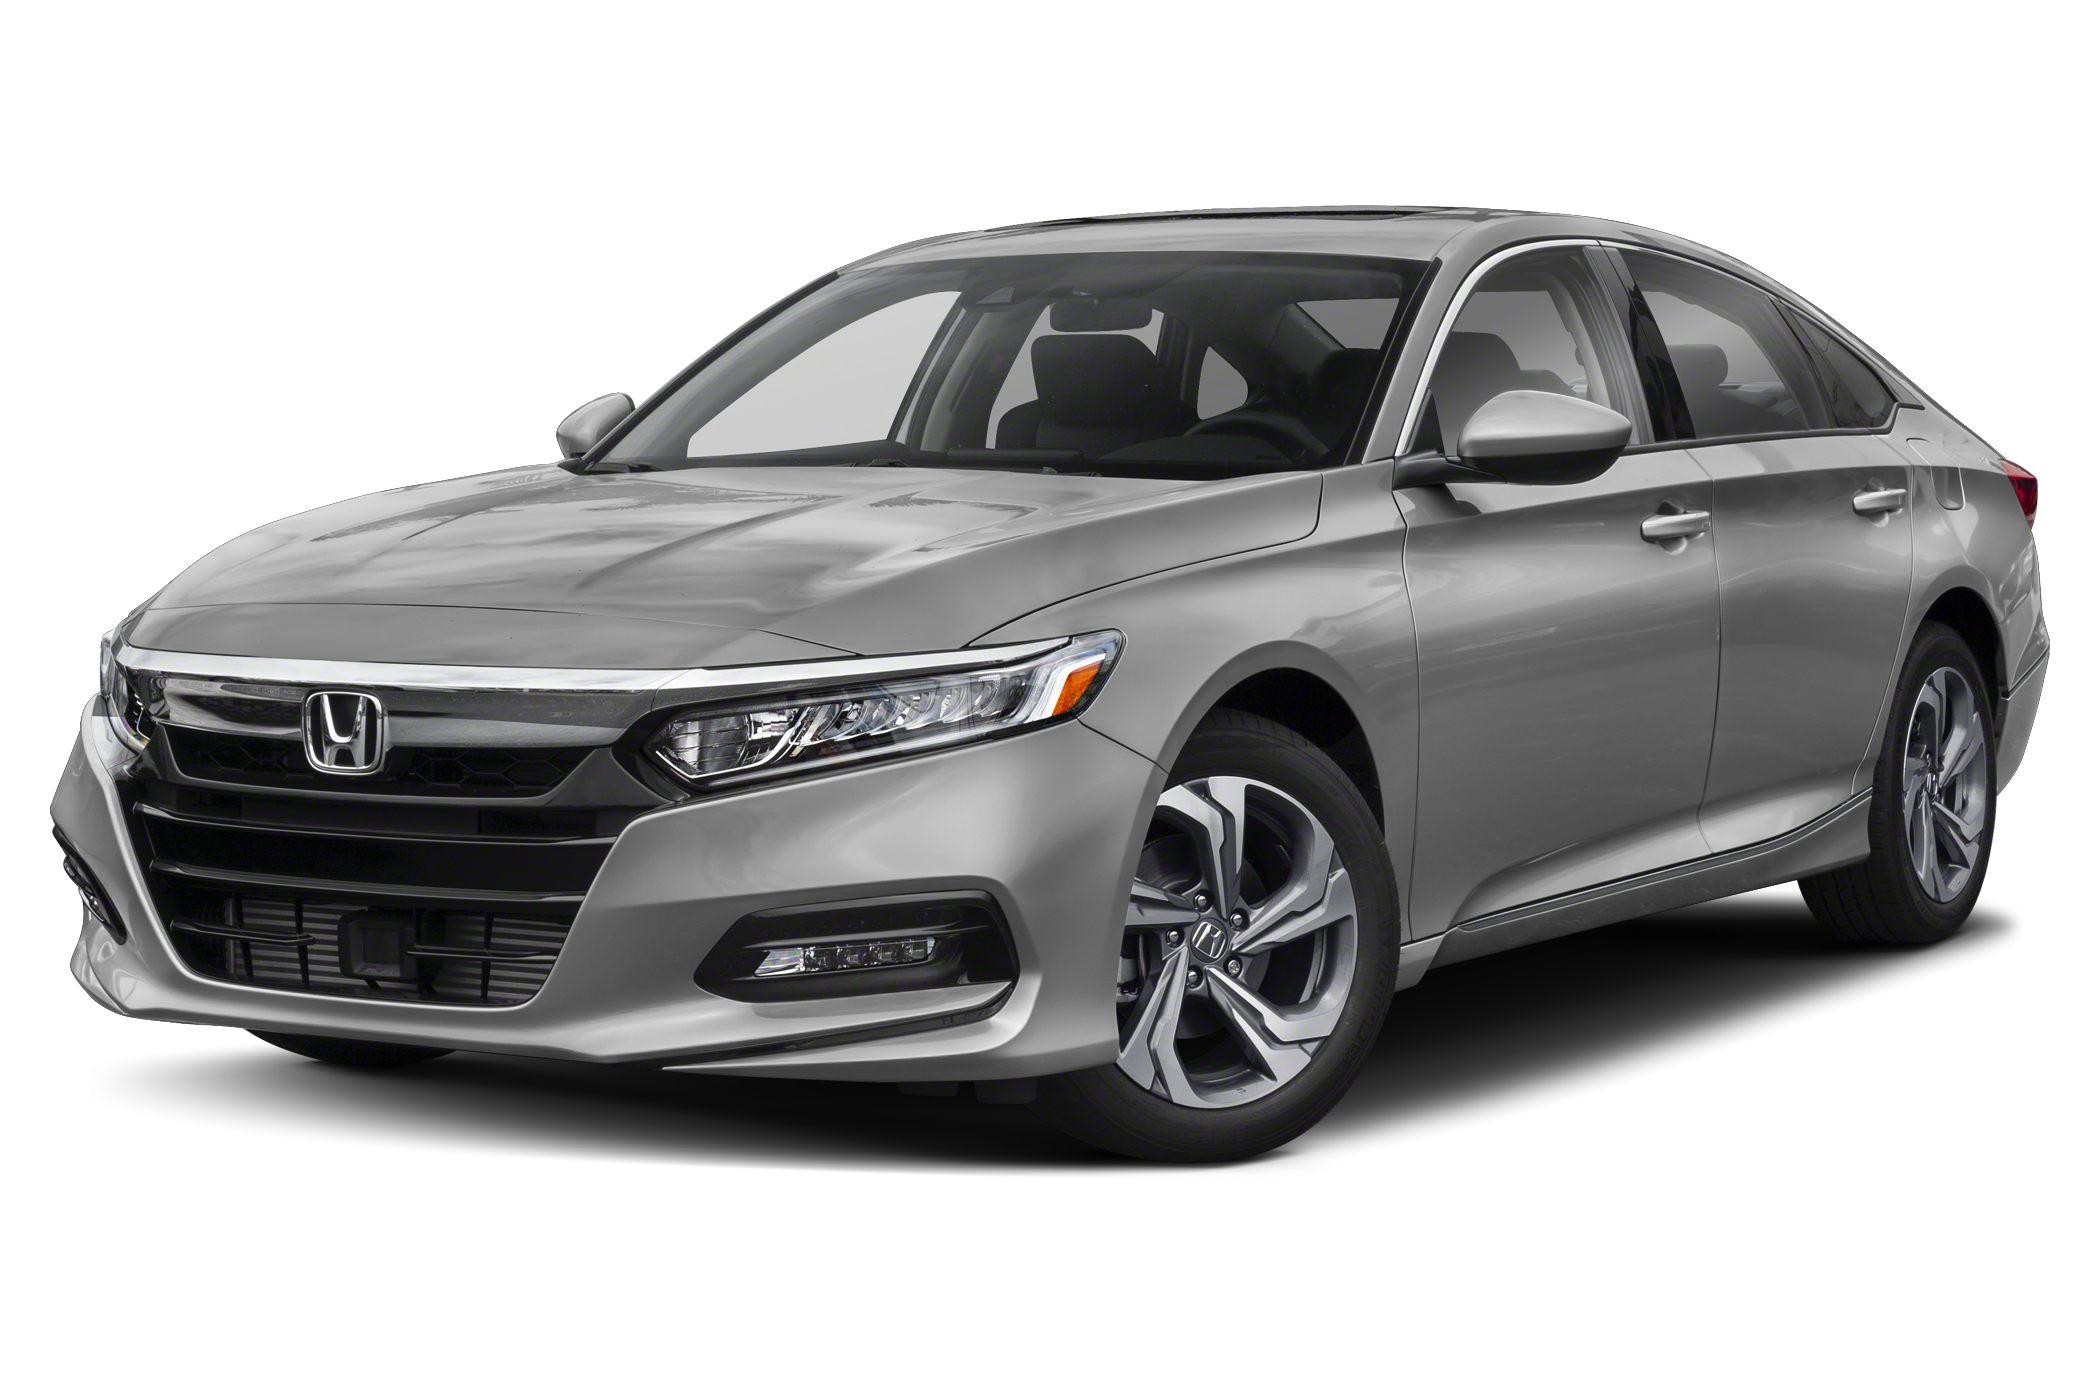 2019 Honda Accord EX 4dr Sedan